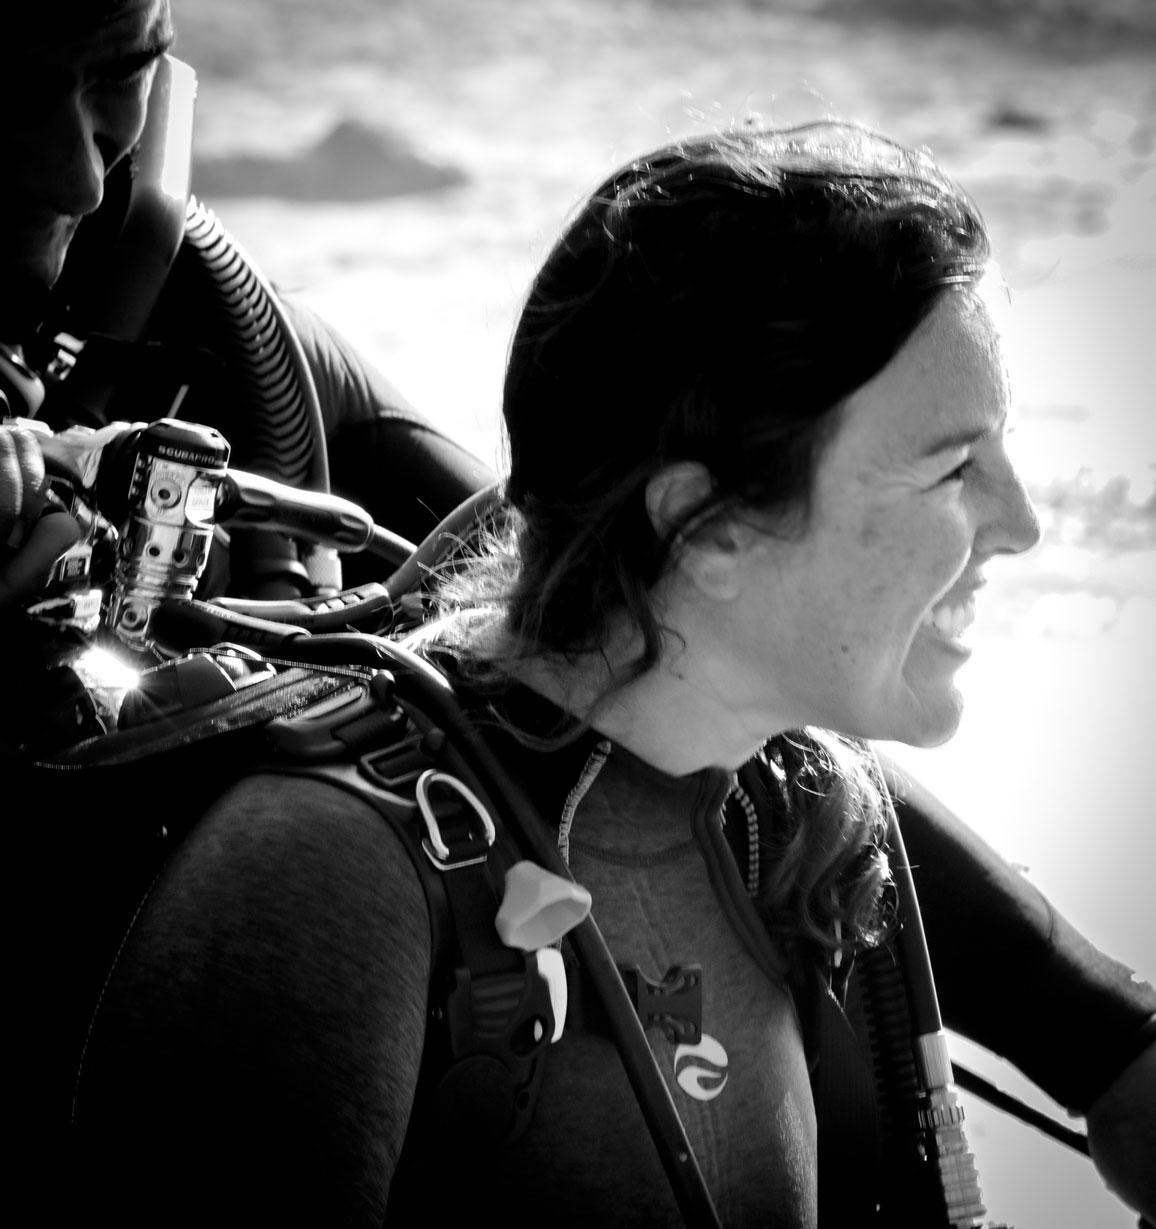 Danna Moore, diving during a Dive Against Debris survey event at Laguna Beach, California